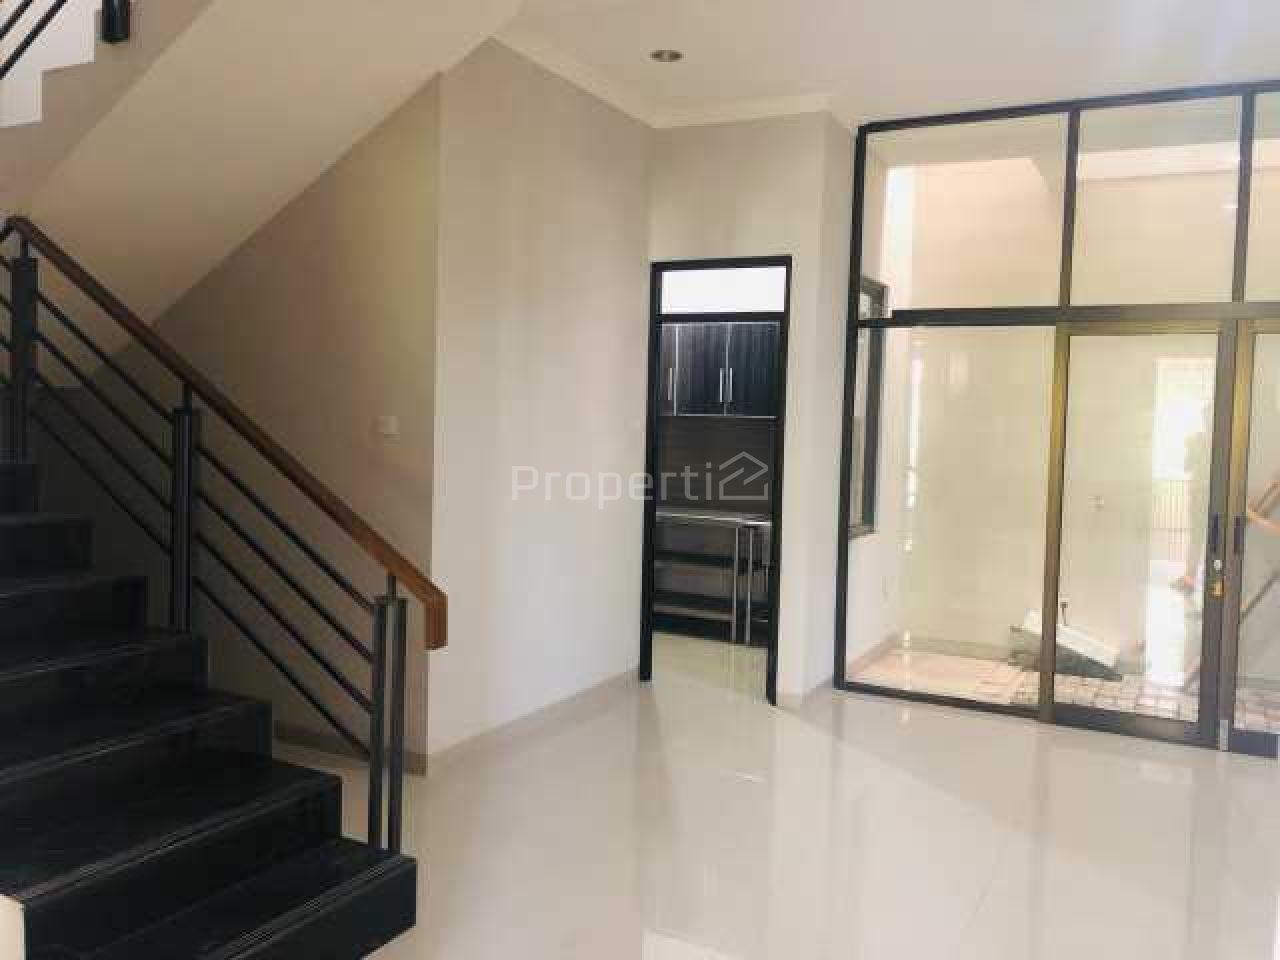 Rumah Baru di Setra Murni, Kota Bandung, Kota Bandung